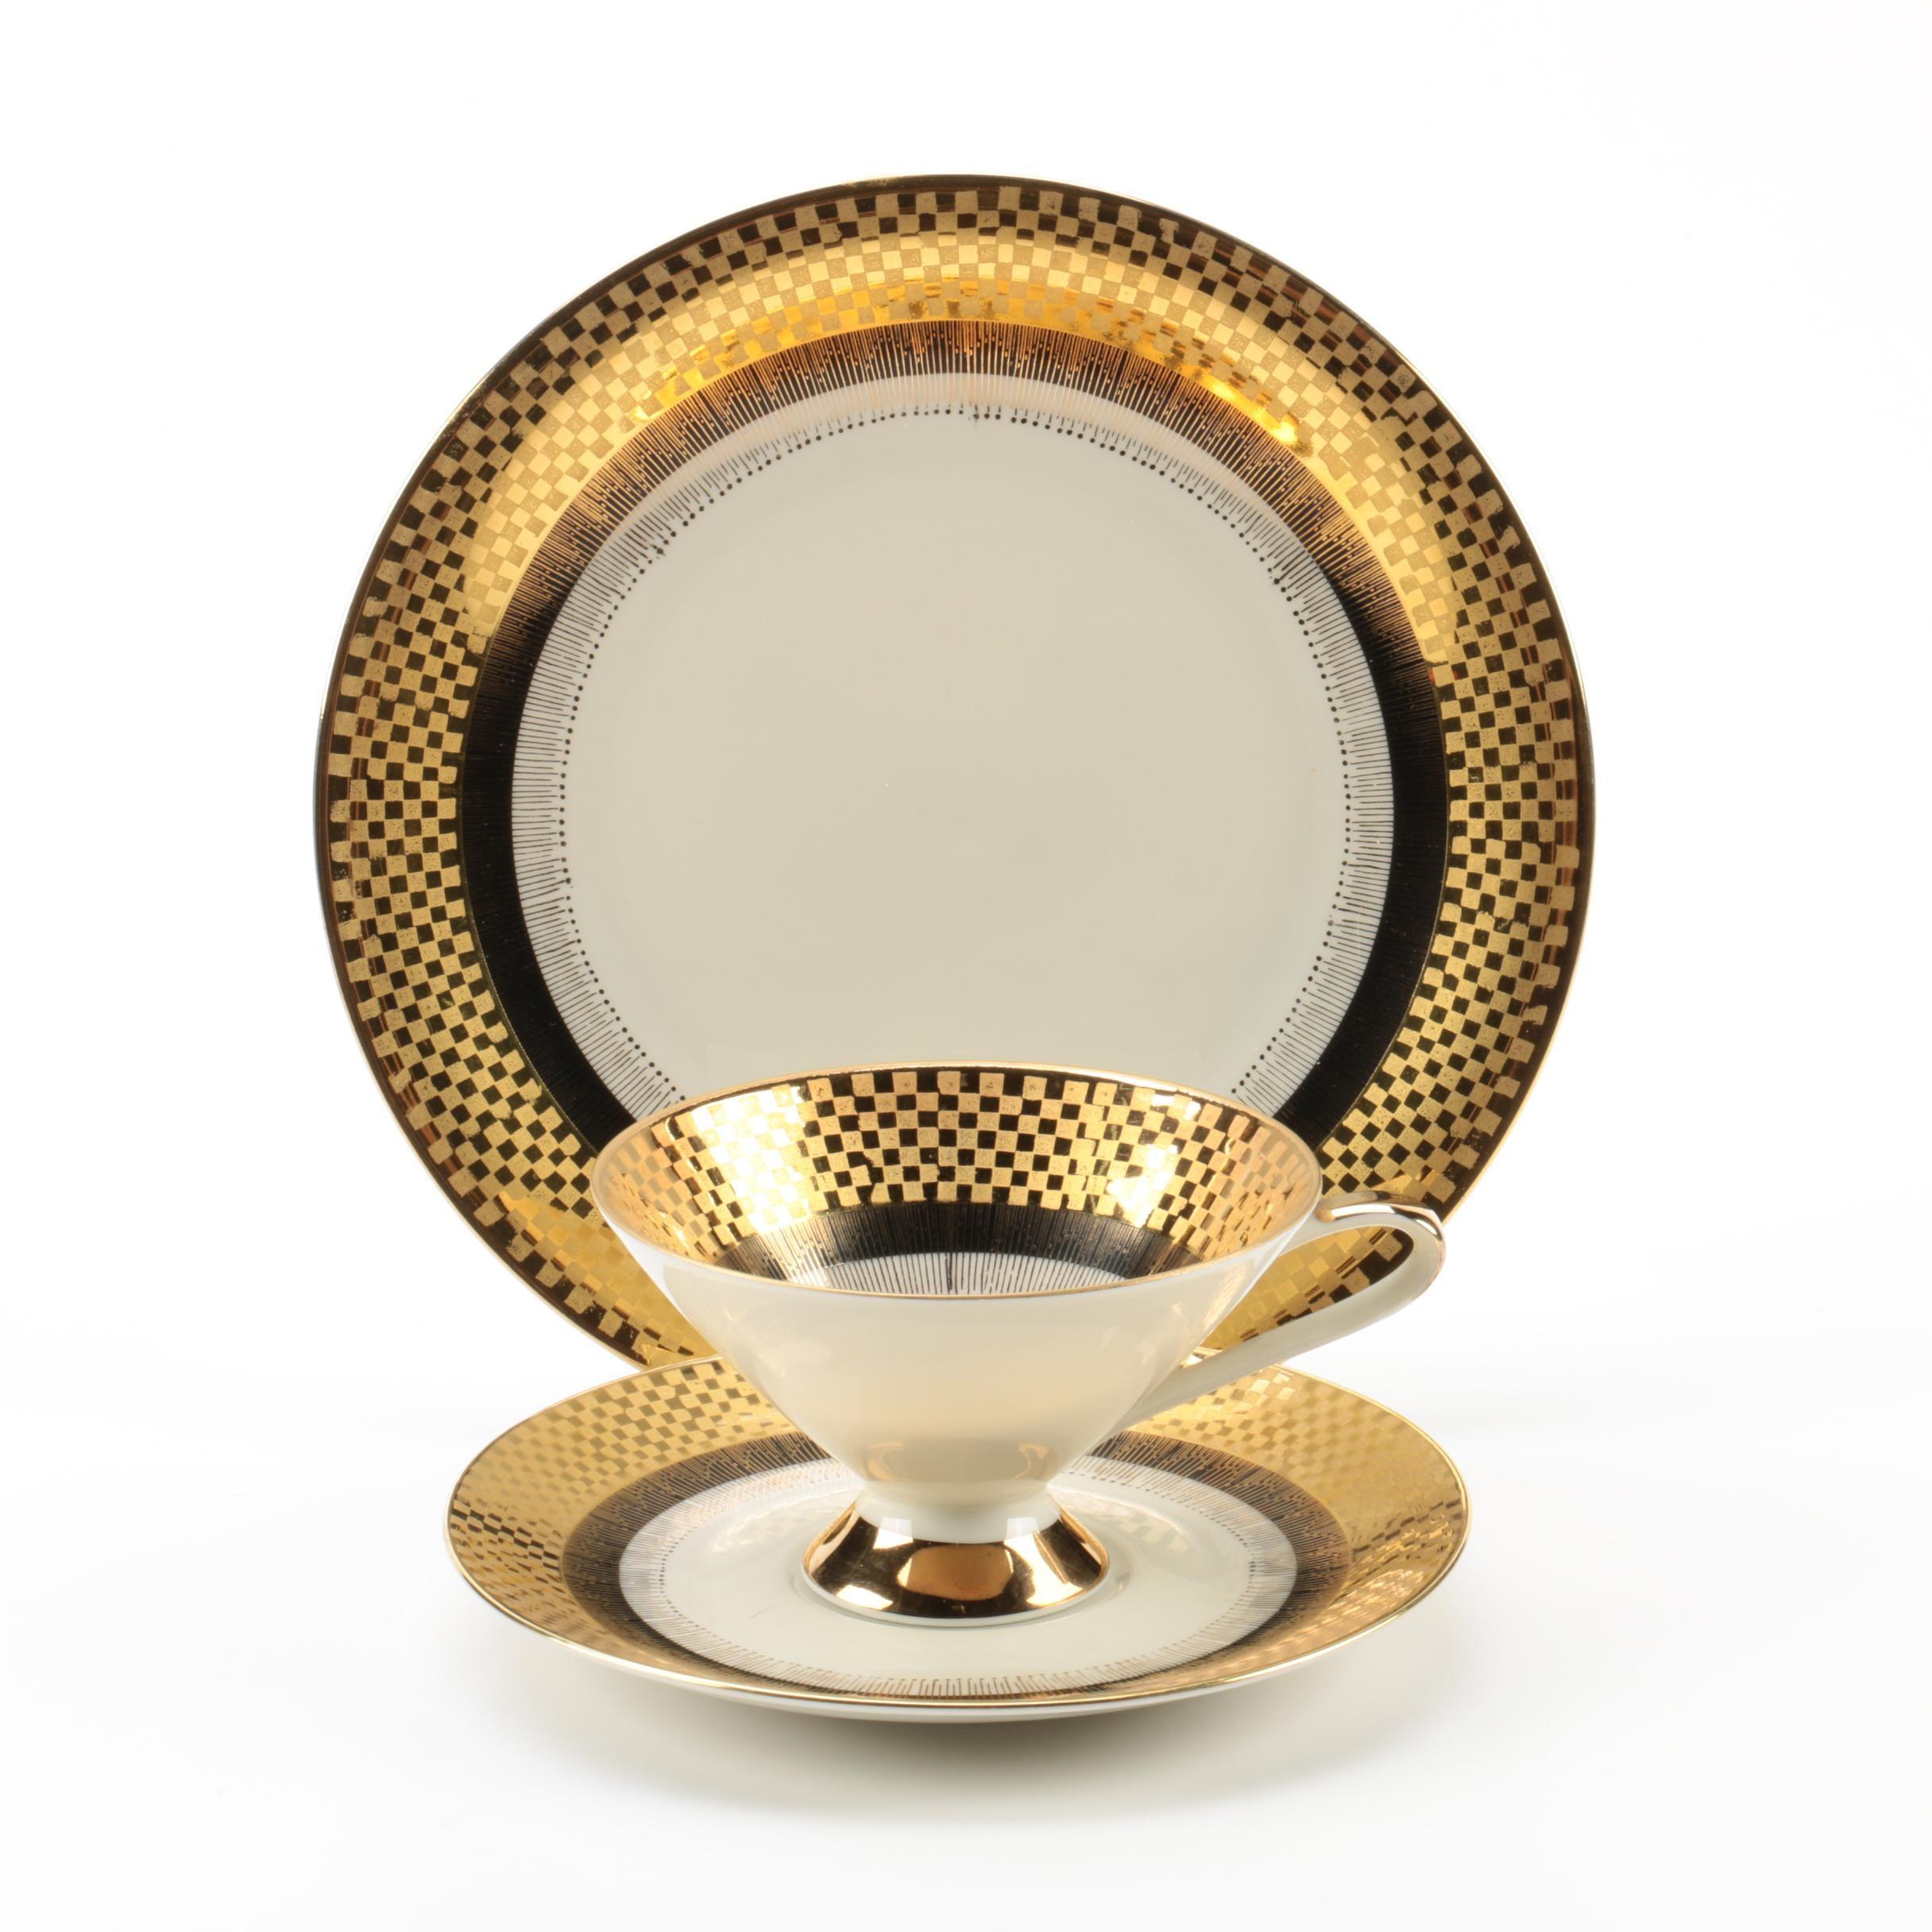 1935-50 Art Deco Style Bavarian Porcelain Tableware ...  sc 1 st  EBTH.com & 1935-50 Art Deco Style Bavarian Porcelain Tableware : EBTH